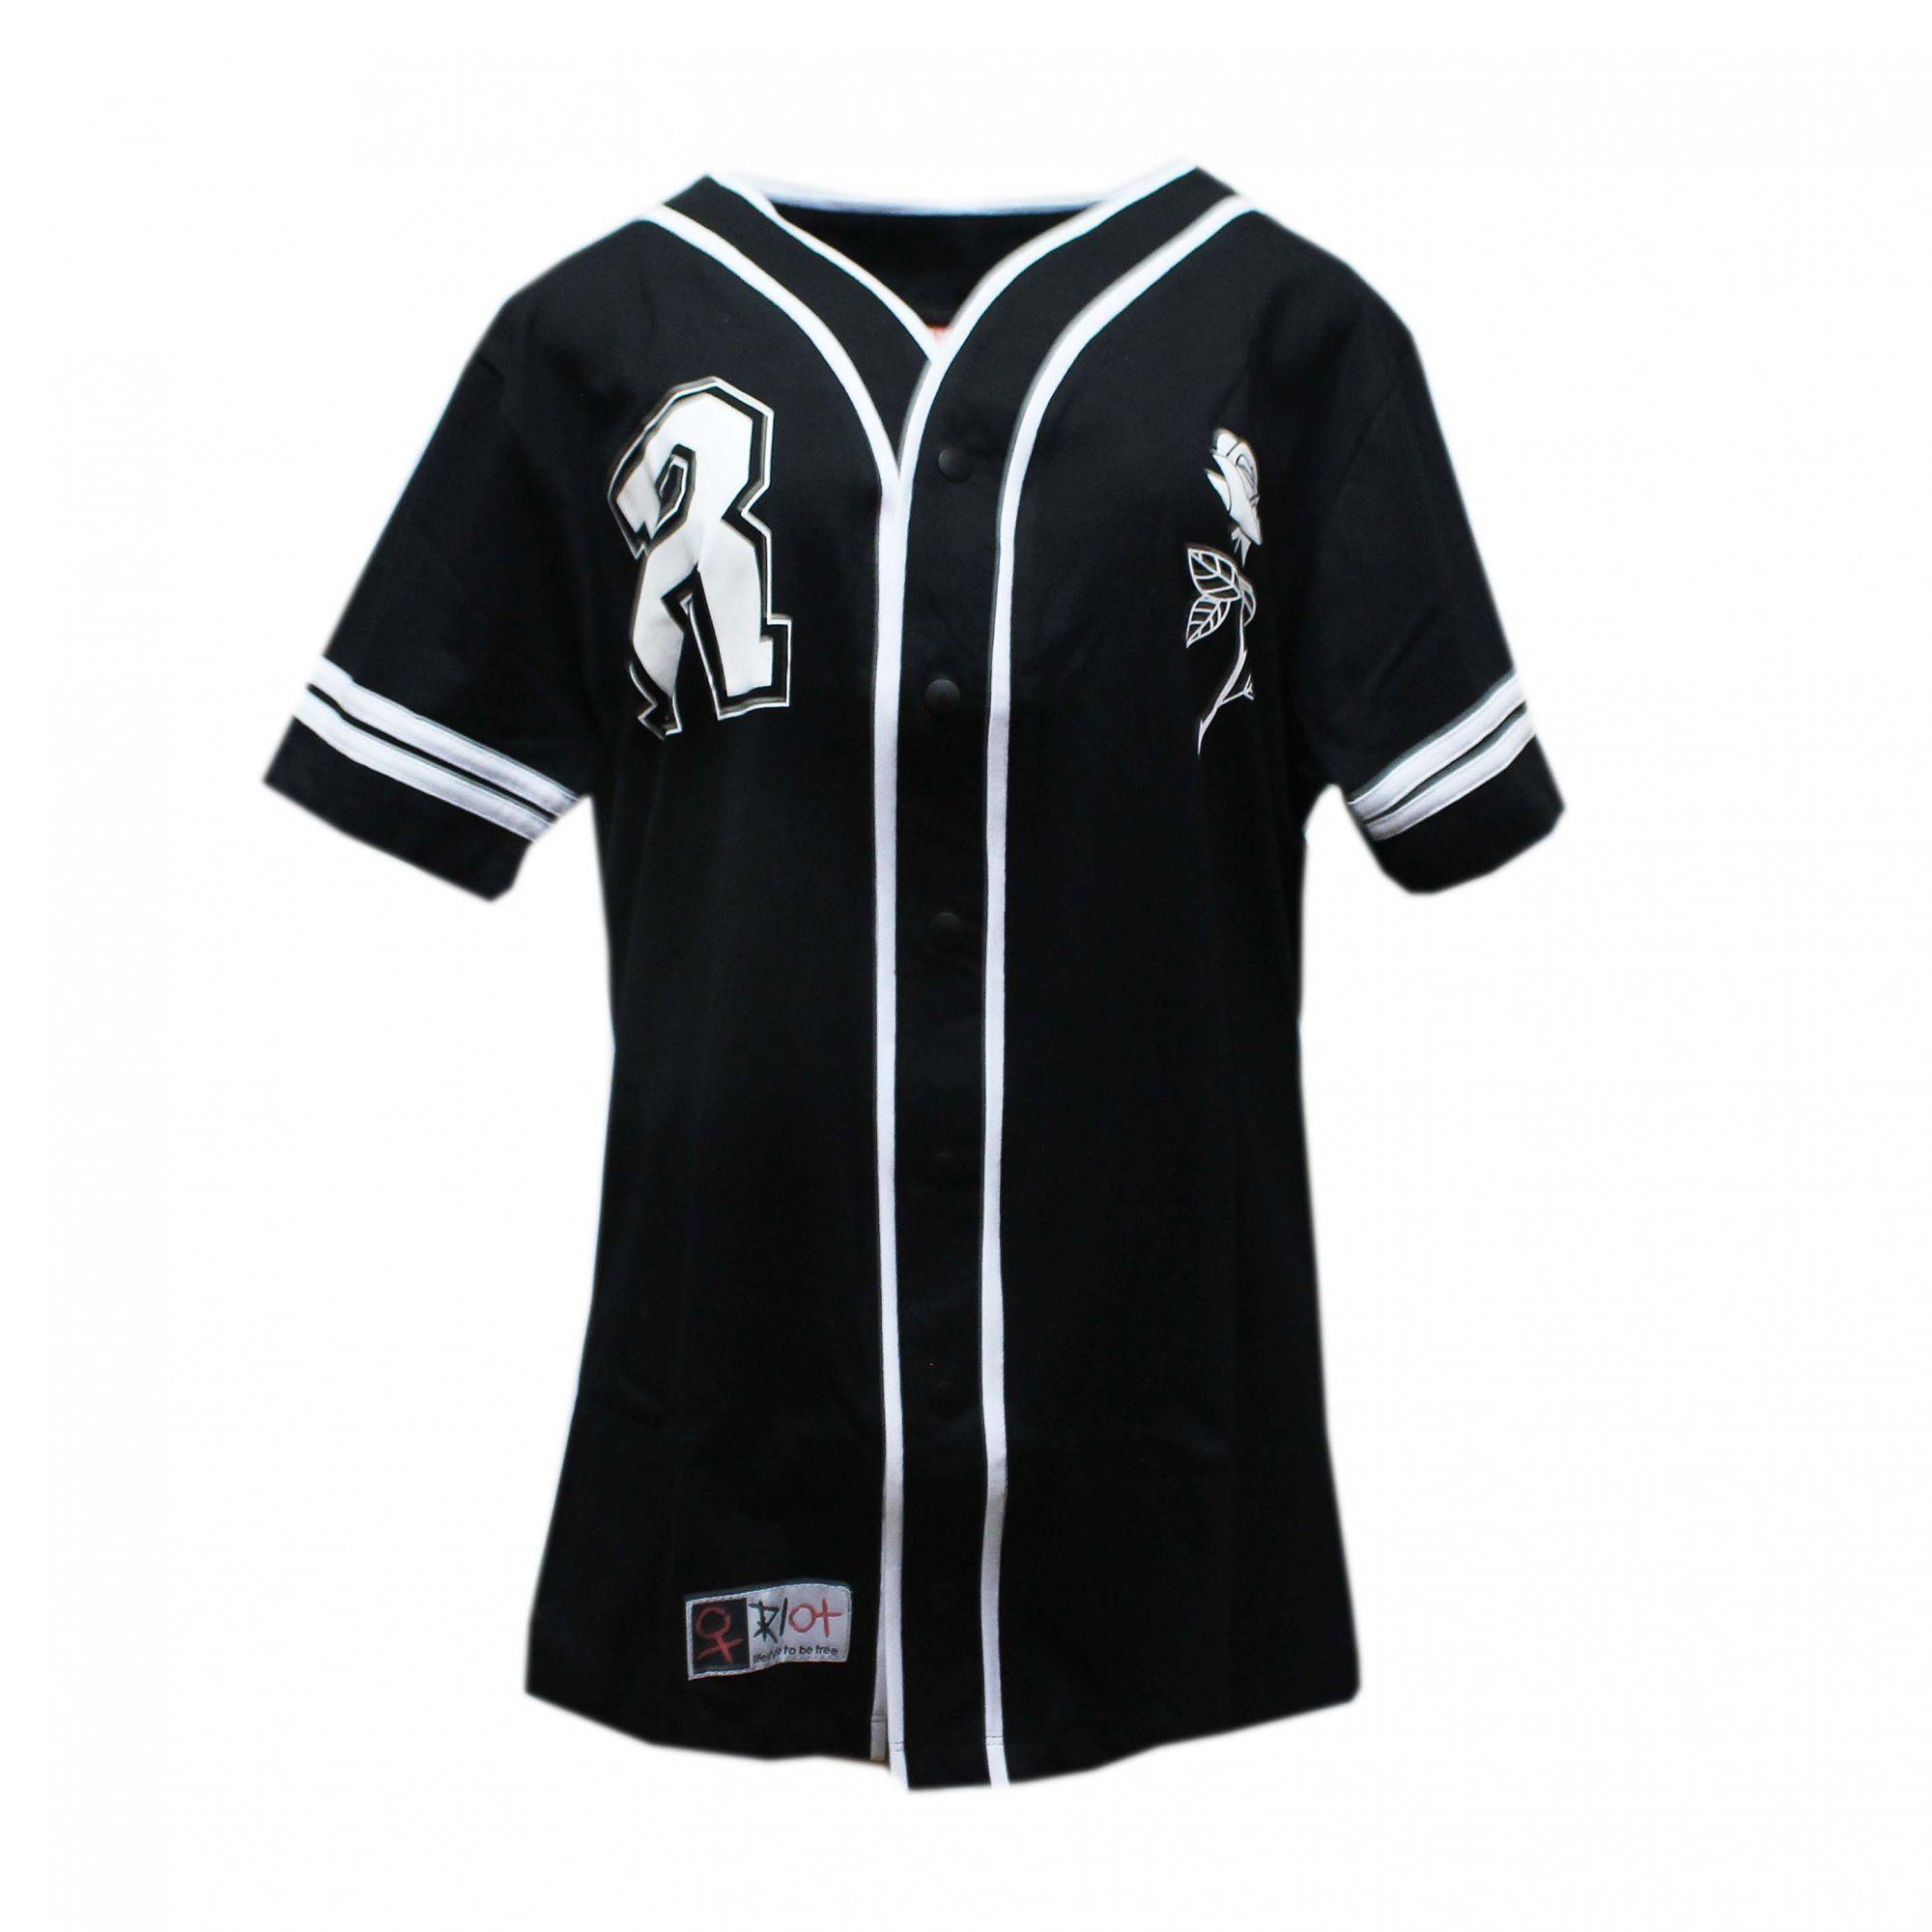 Camiseta Riot Baseball Passion - Preto